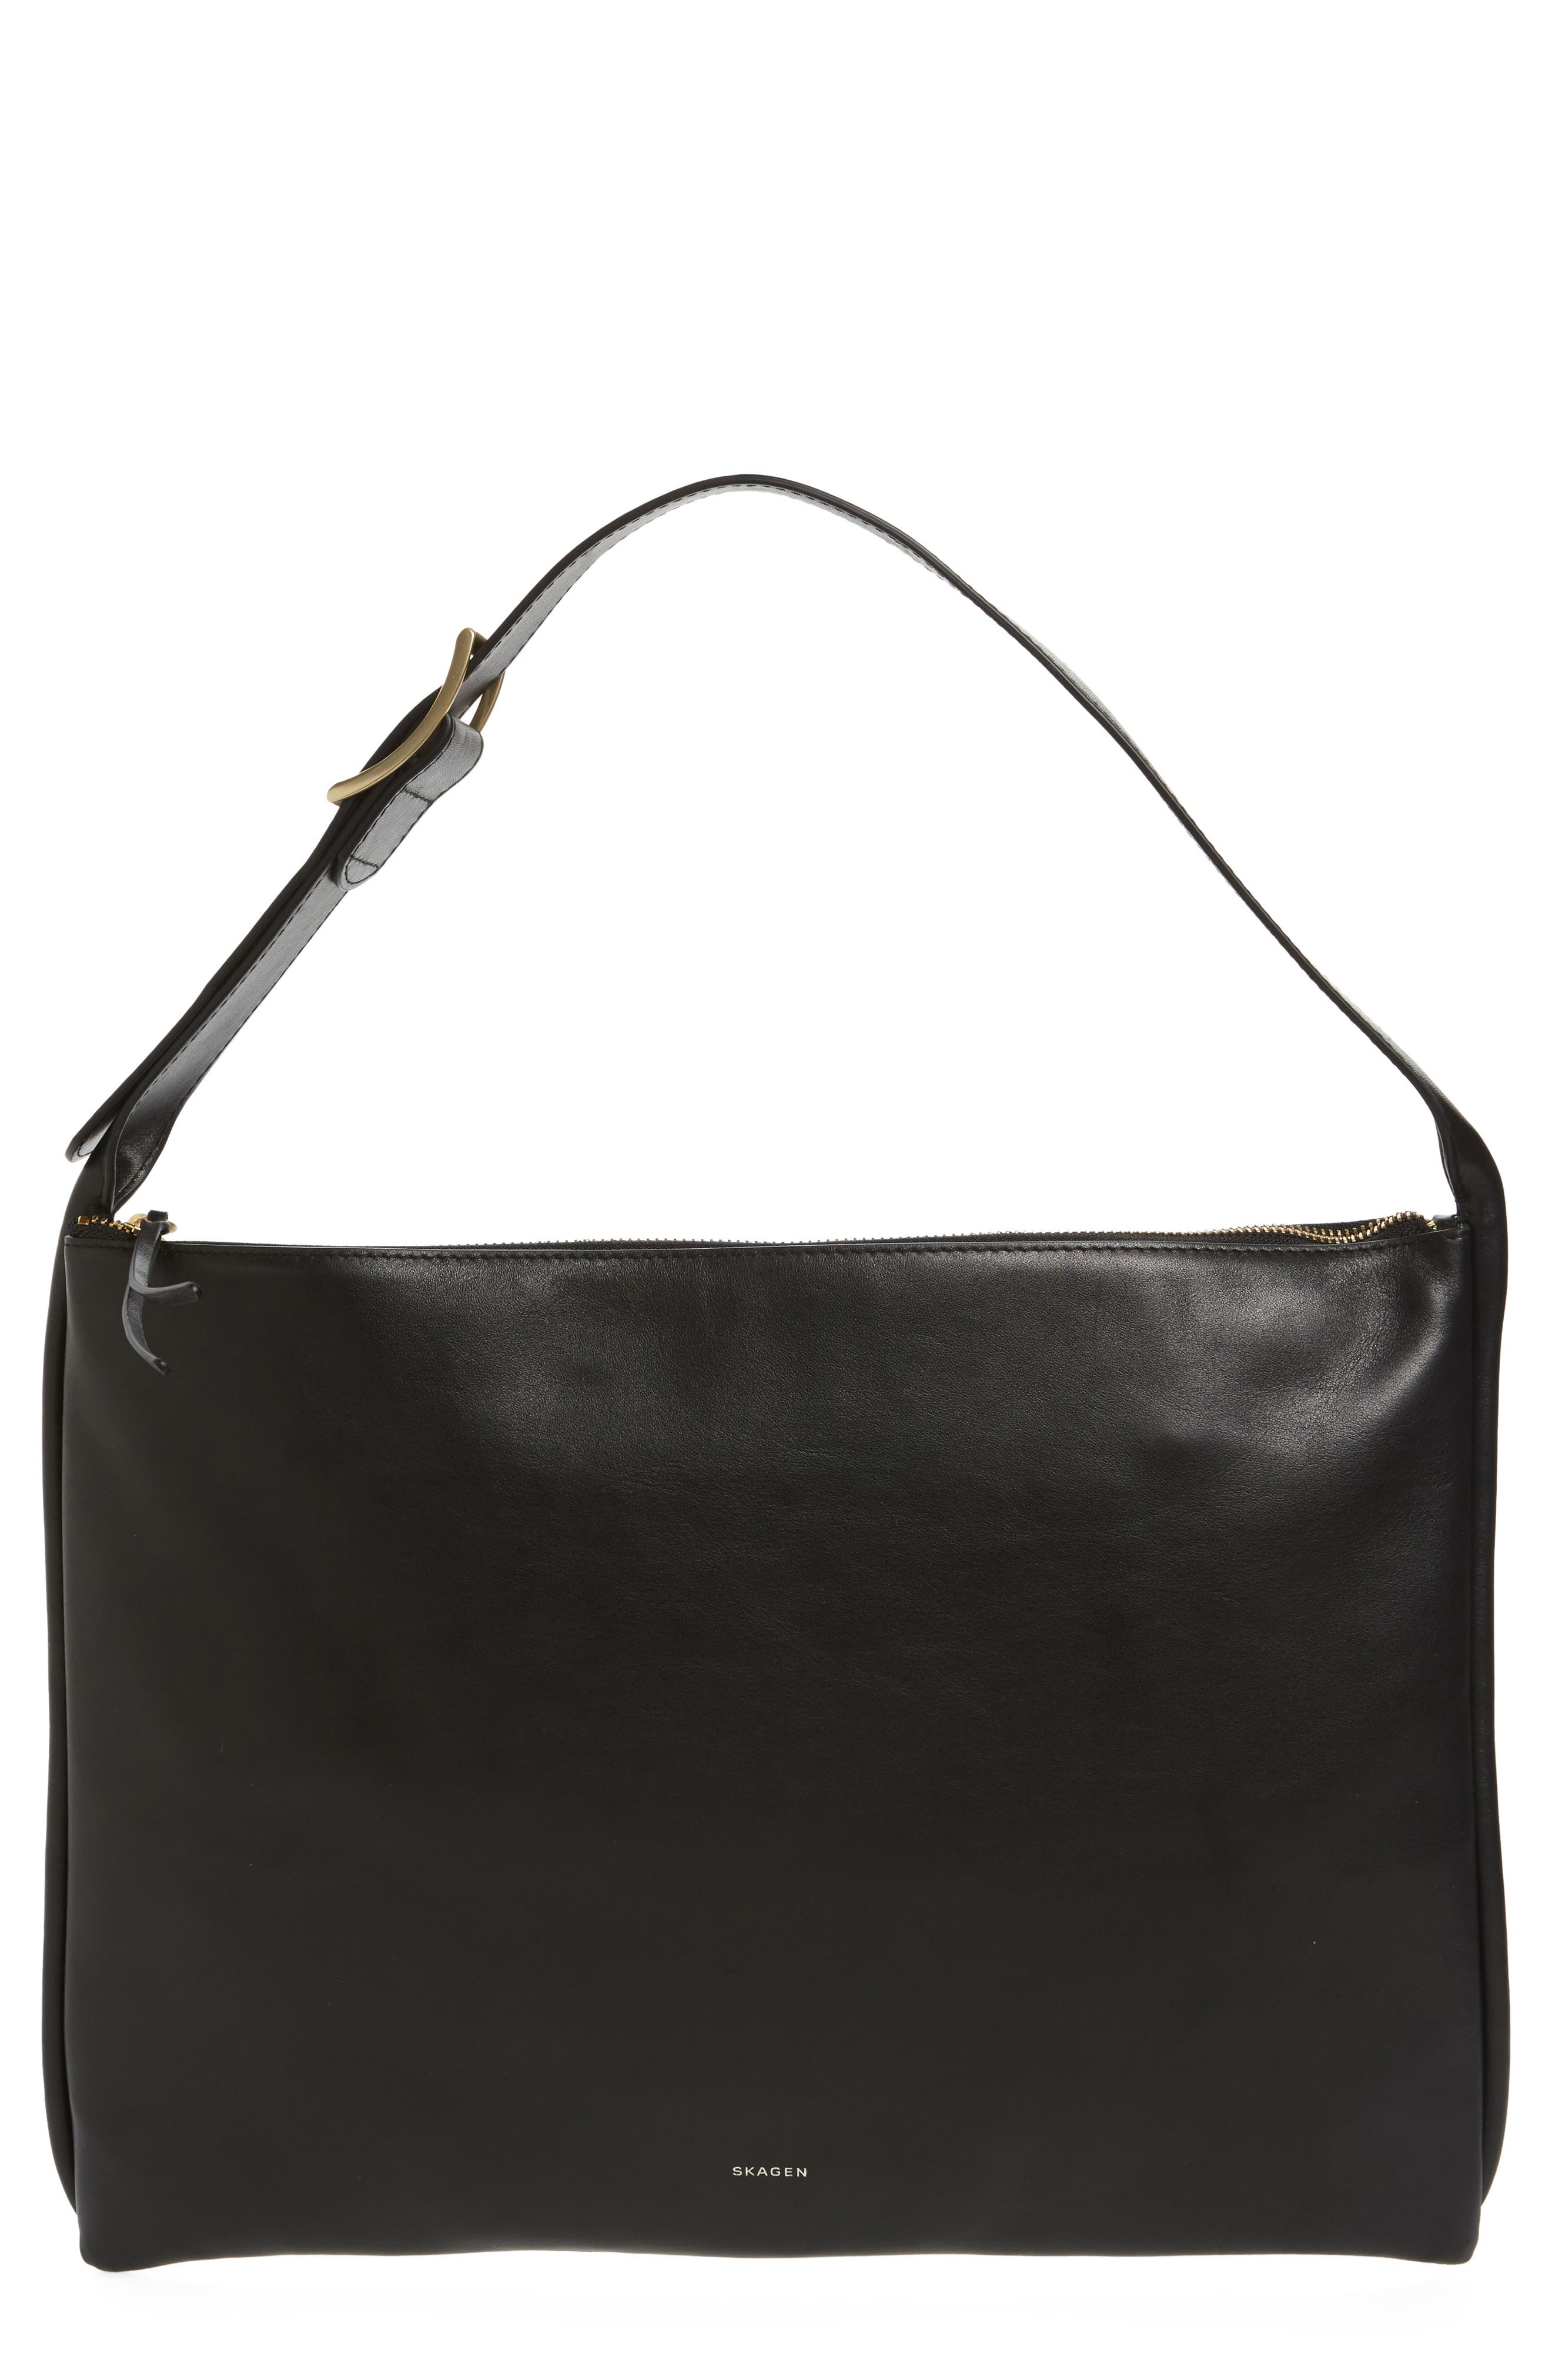 Anesa Leather Shoulder Bag,                             Main thumbnail 1, color,                             001